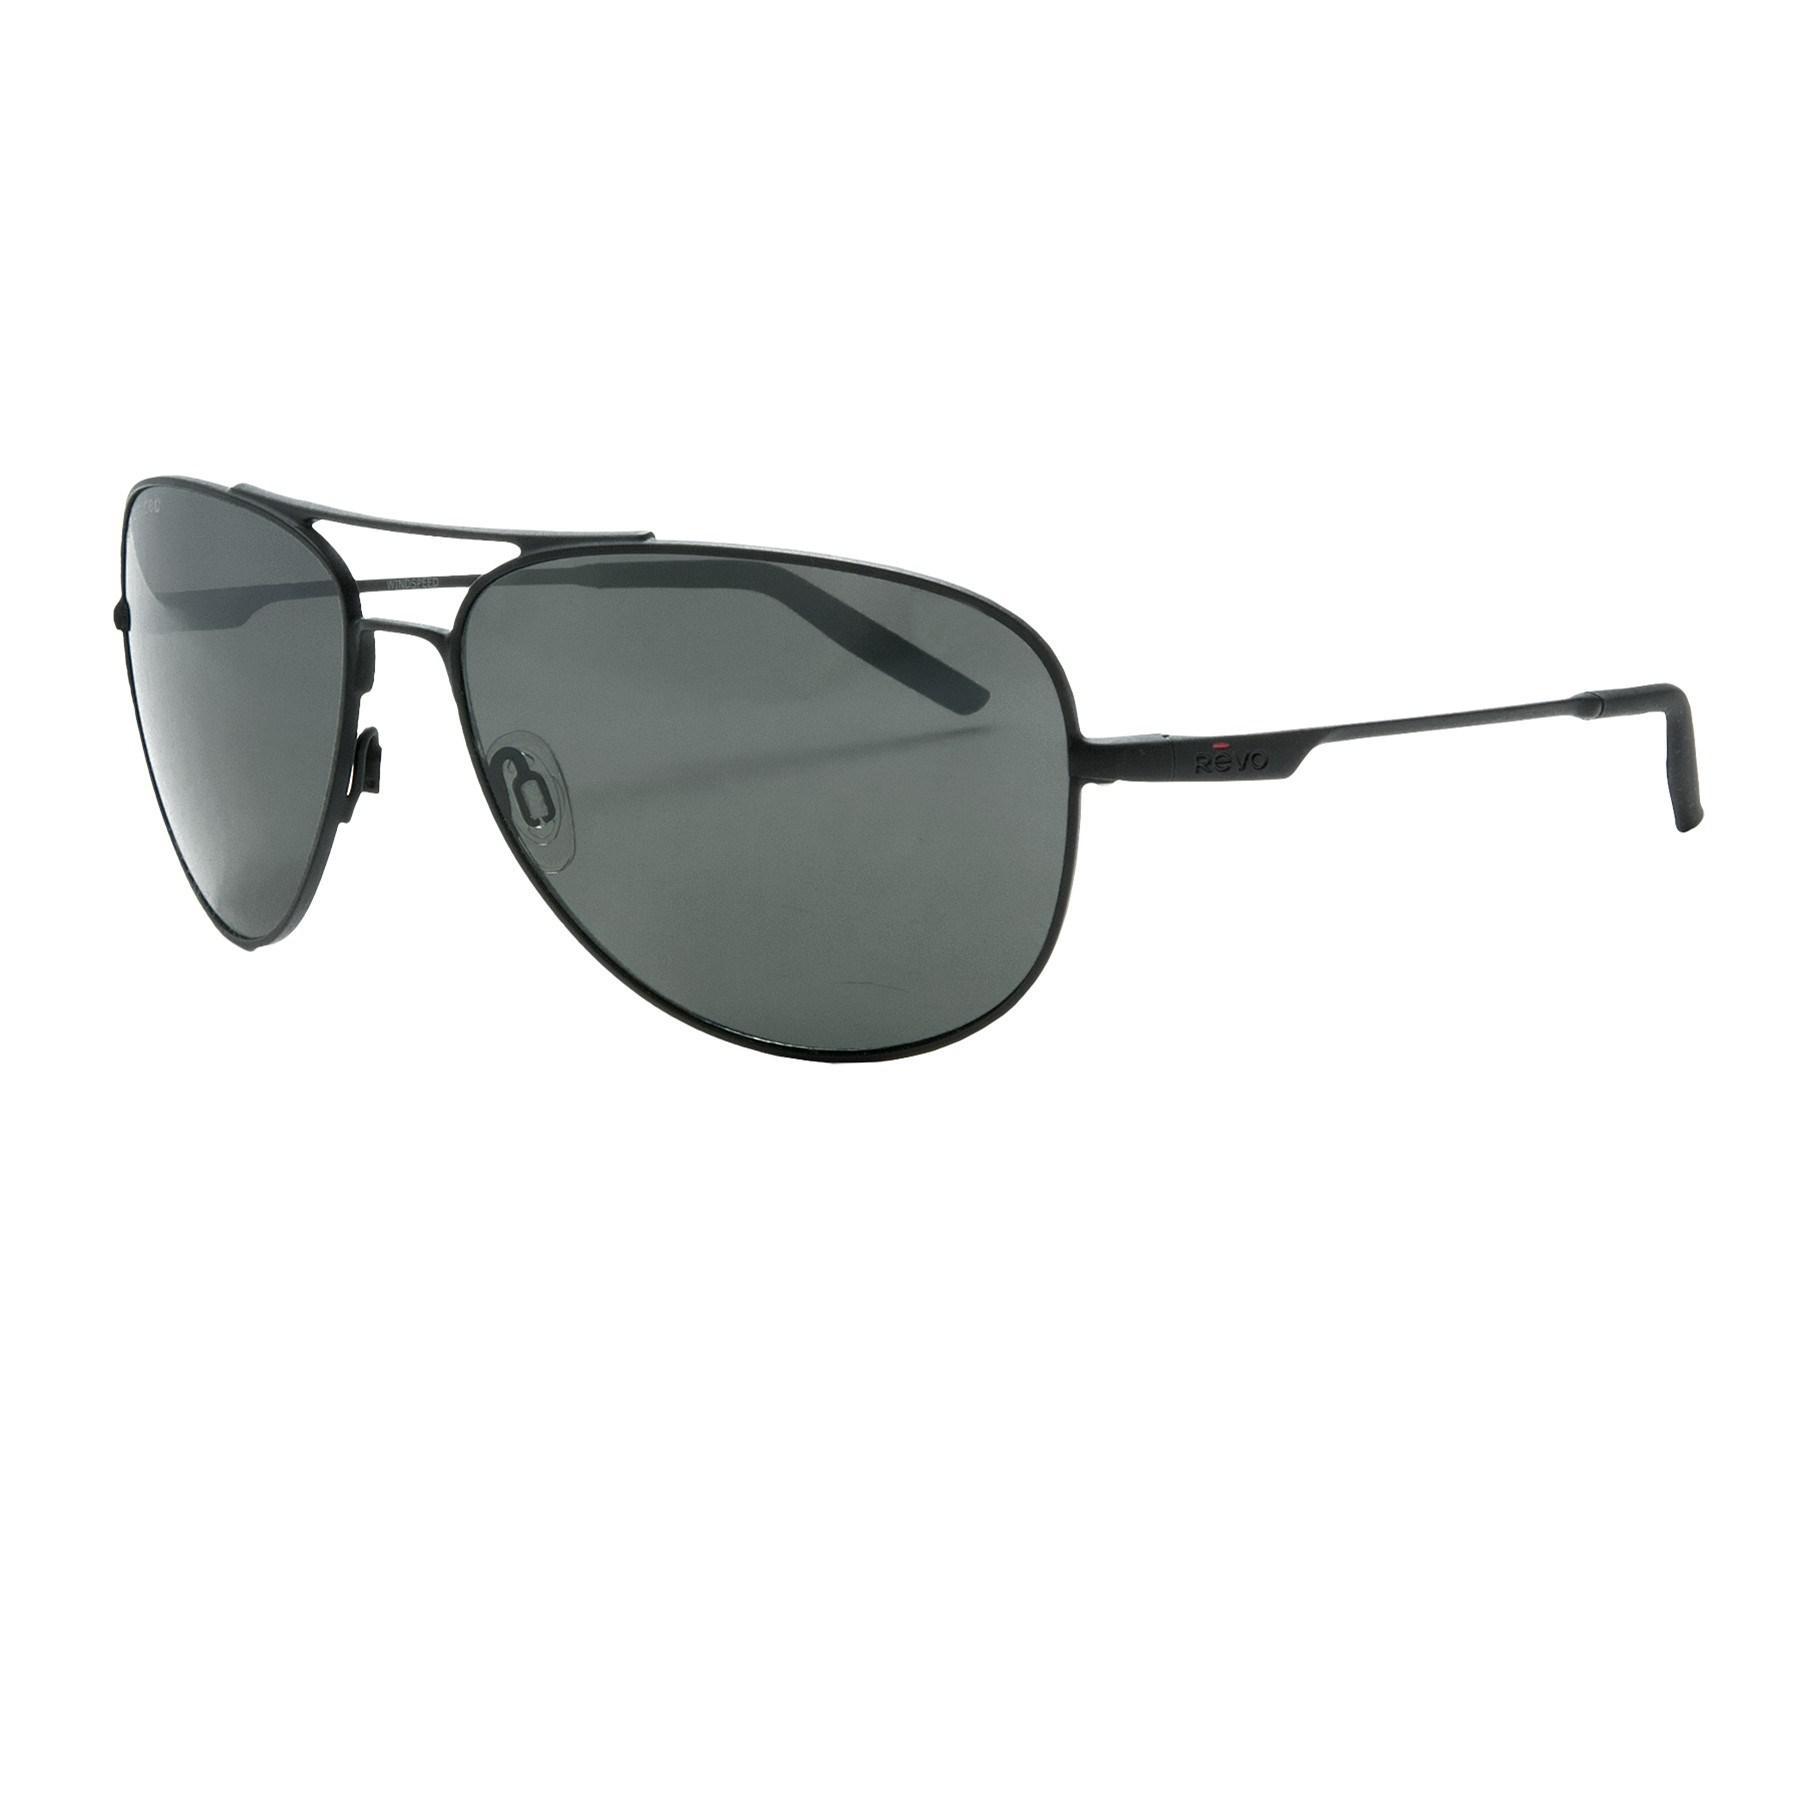 0b7d2f402d1 Lyst - Revo Windspeed Sunglasses in Black for Men